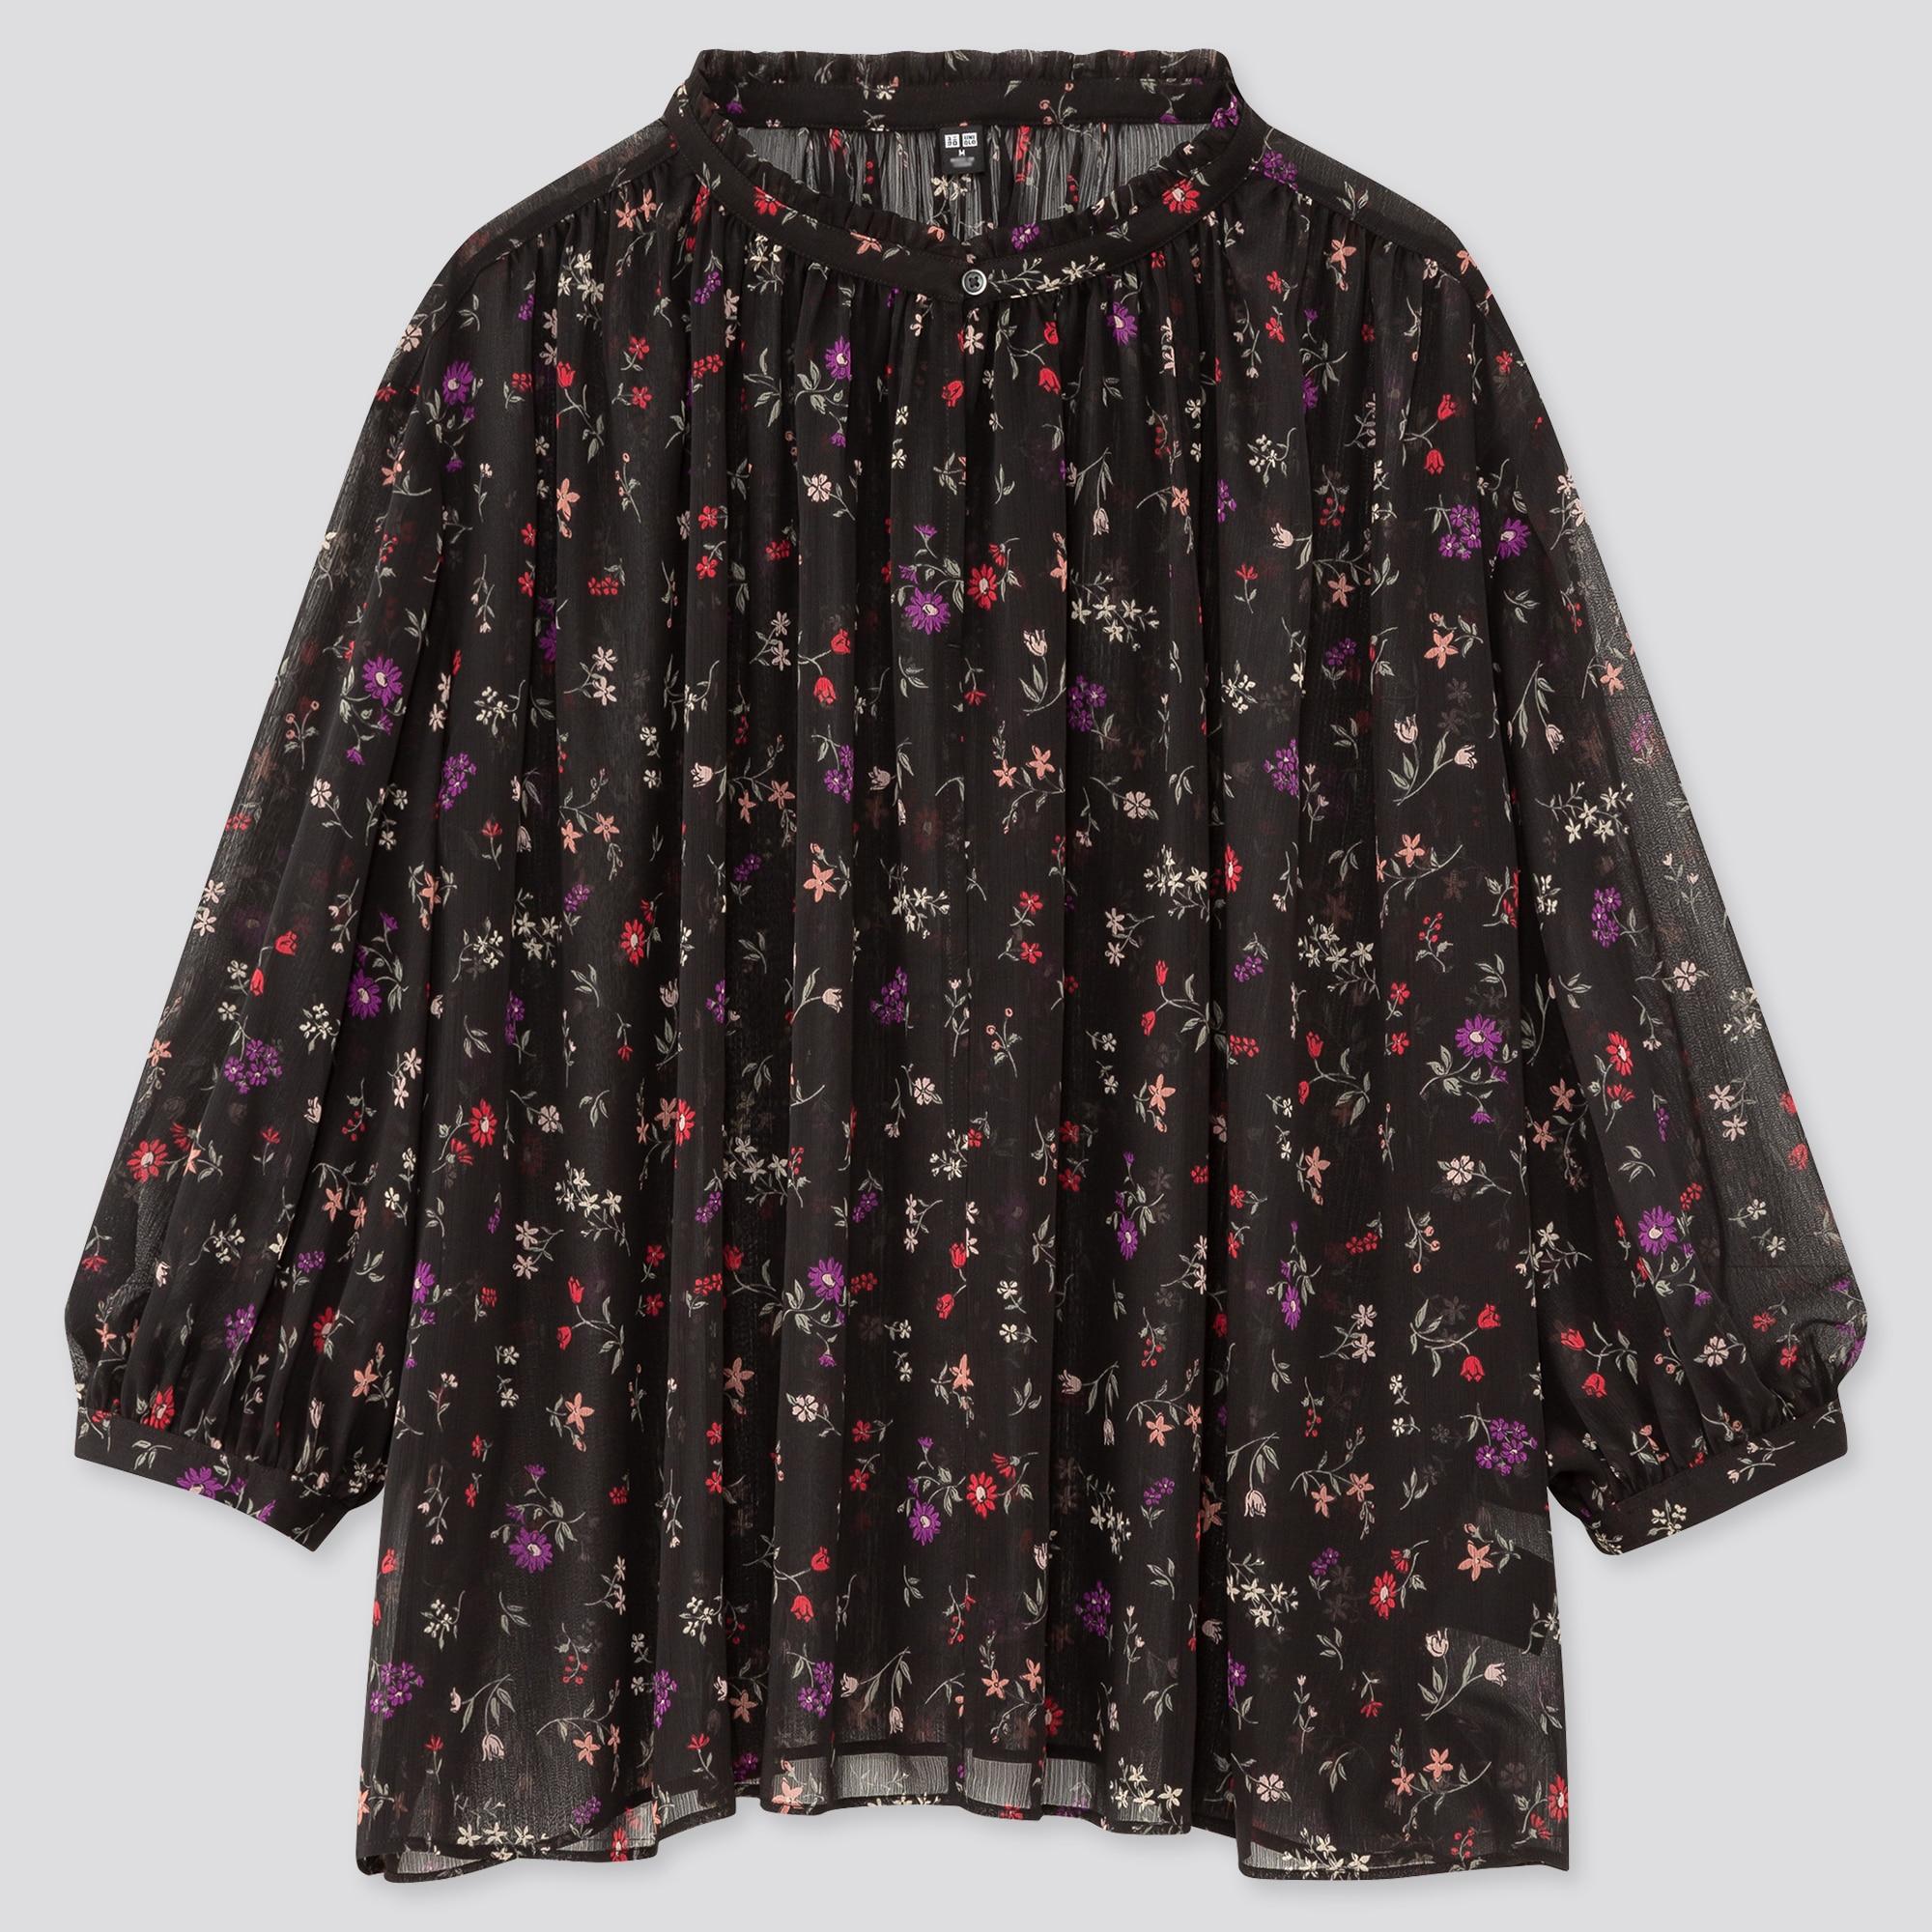 Women Joy Of Print Chiffon 3/4 Sleeved Blouse